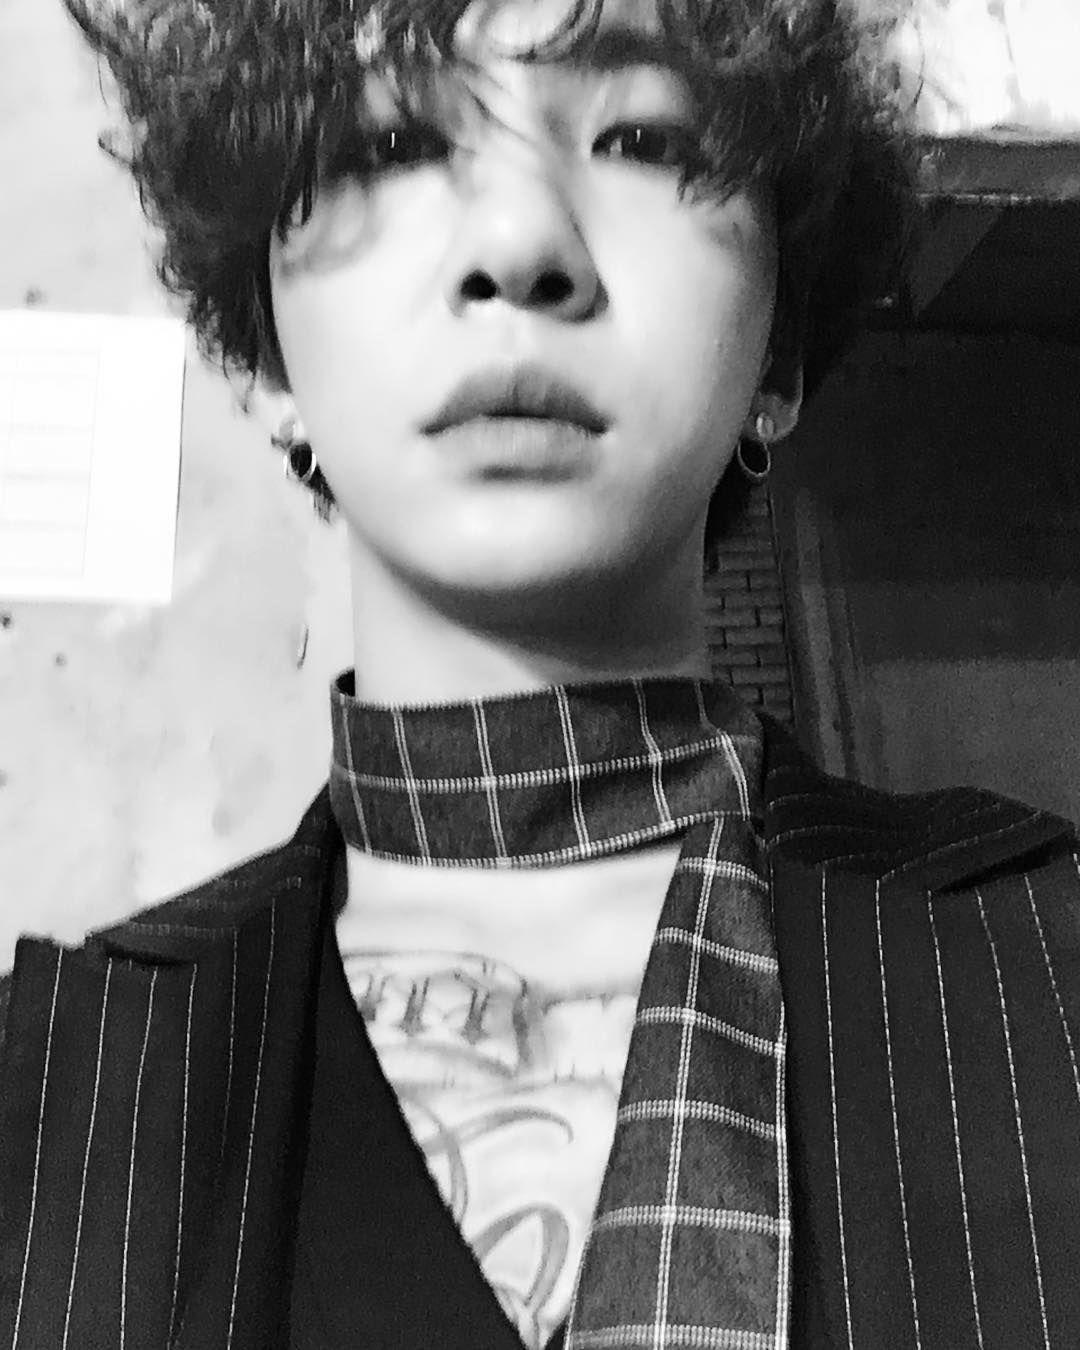 Bbang Has Graced Us With His Handsome Aesthetic Self Once More Yongguk Bap Bap Jongup Bap Bangs